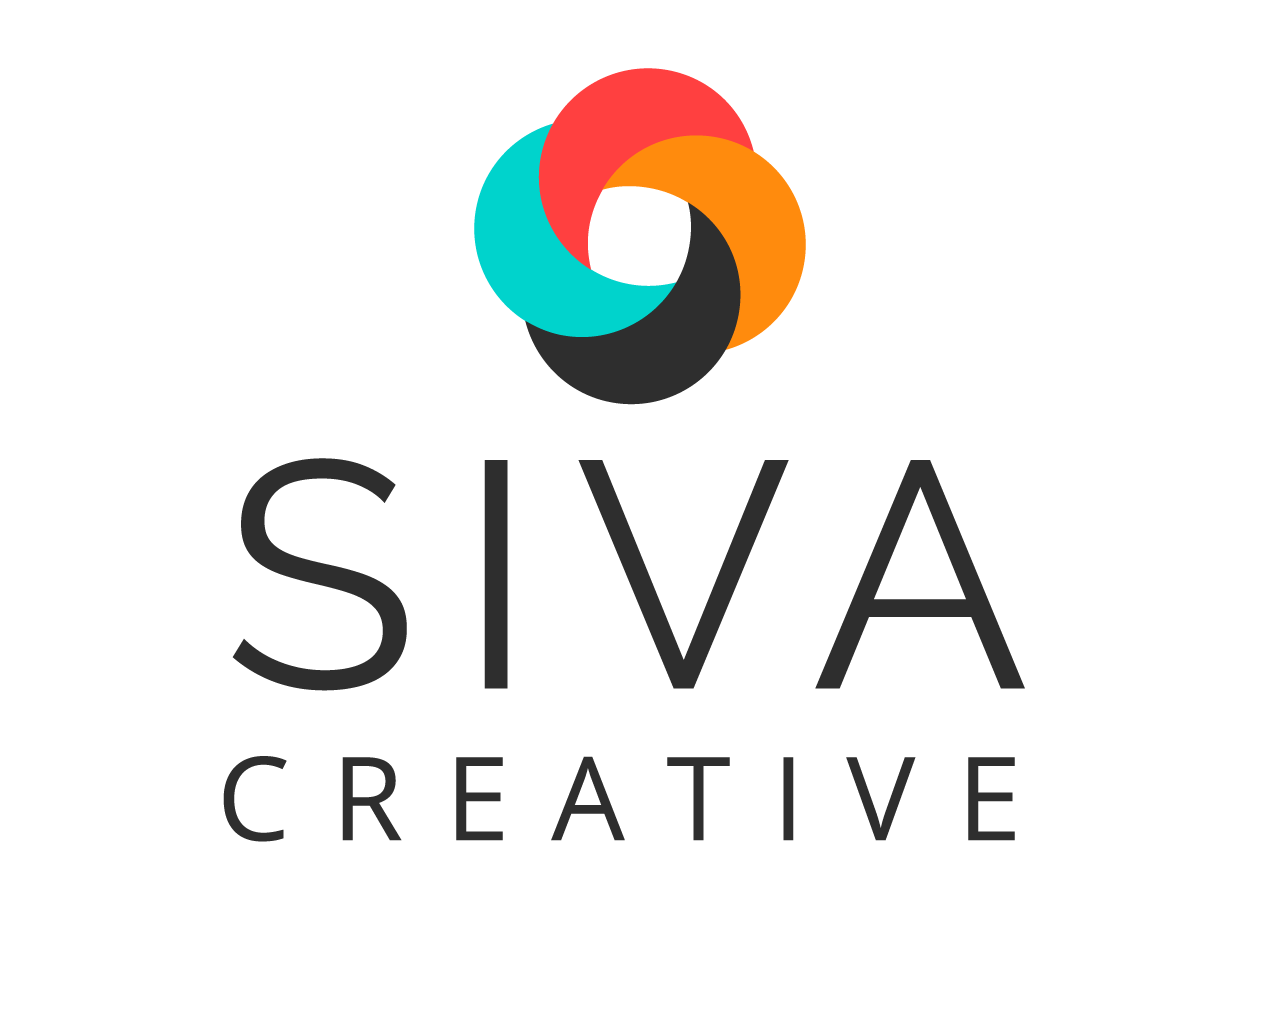 Siva Creative Inc